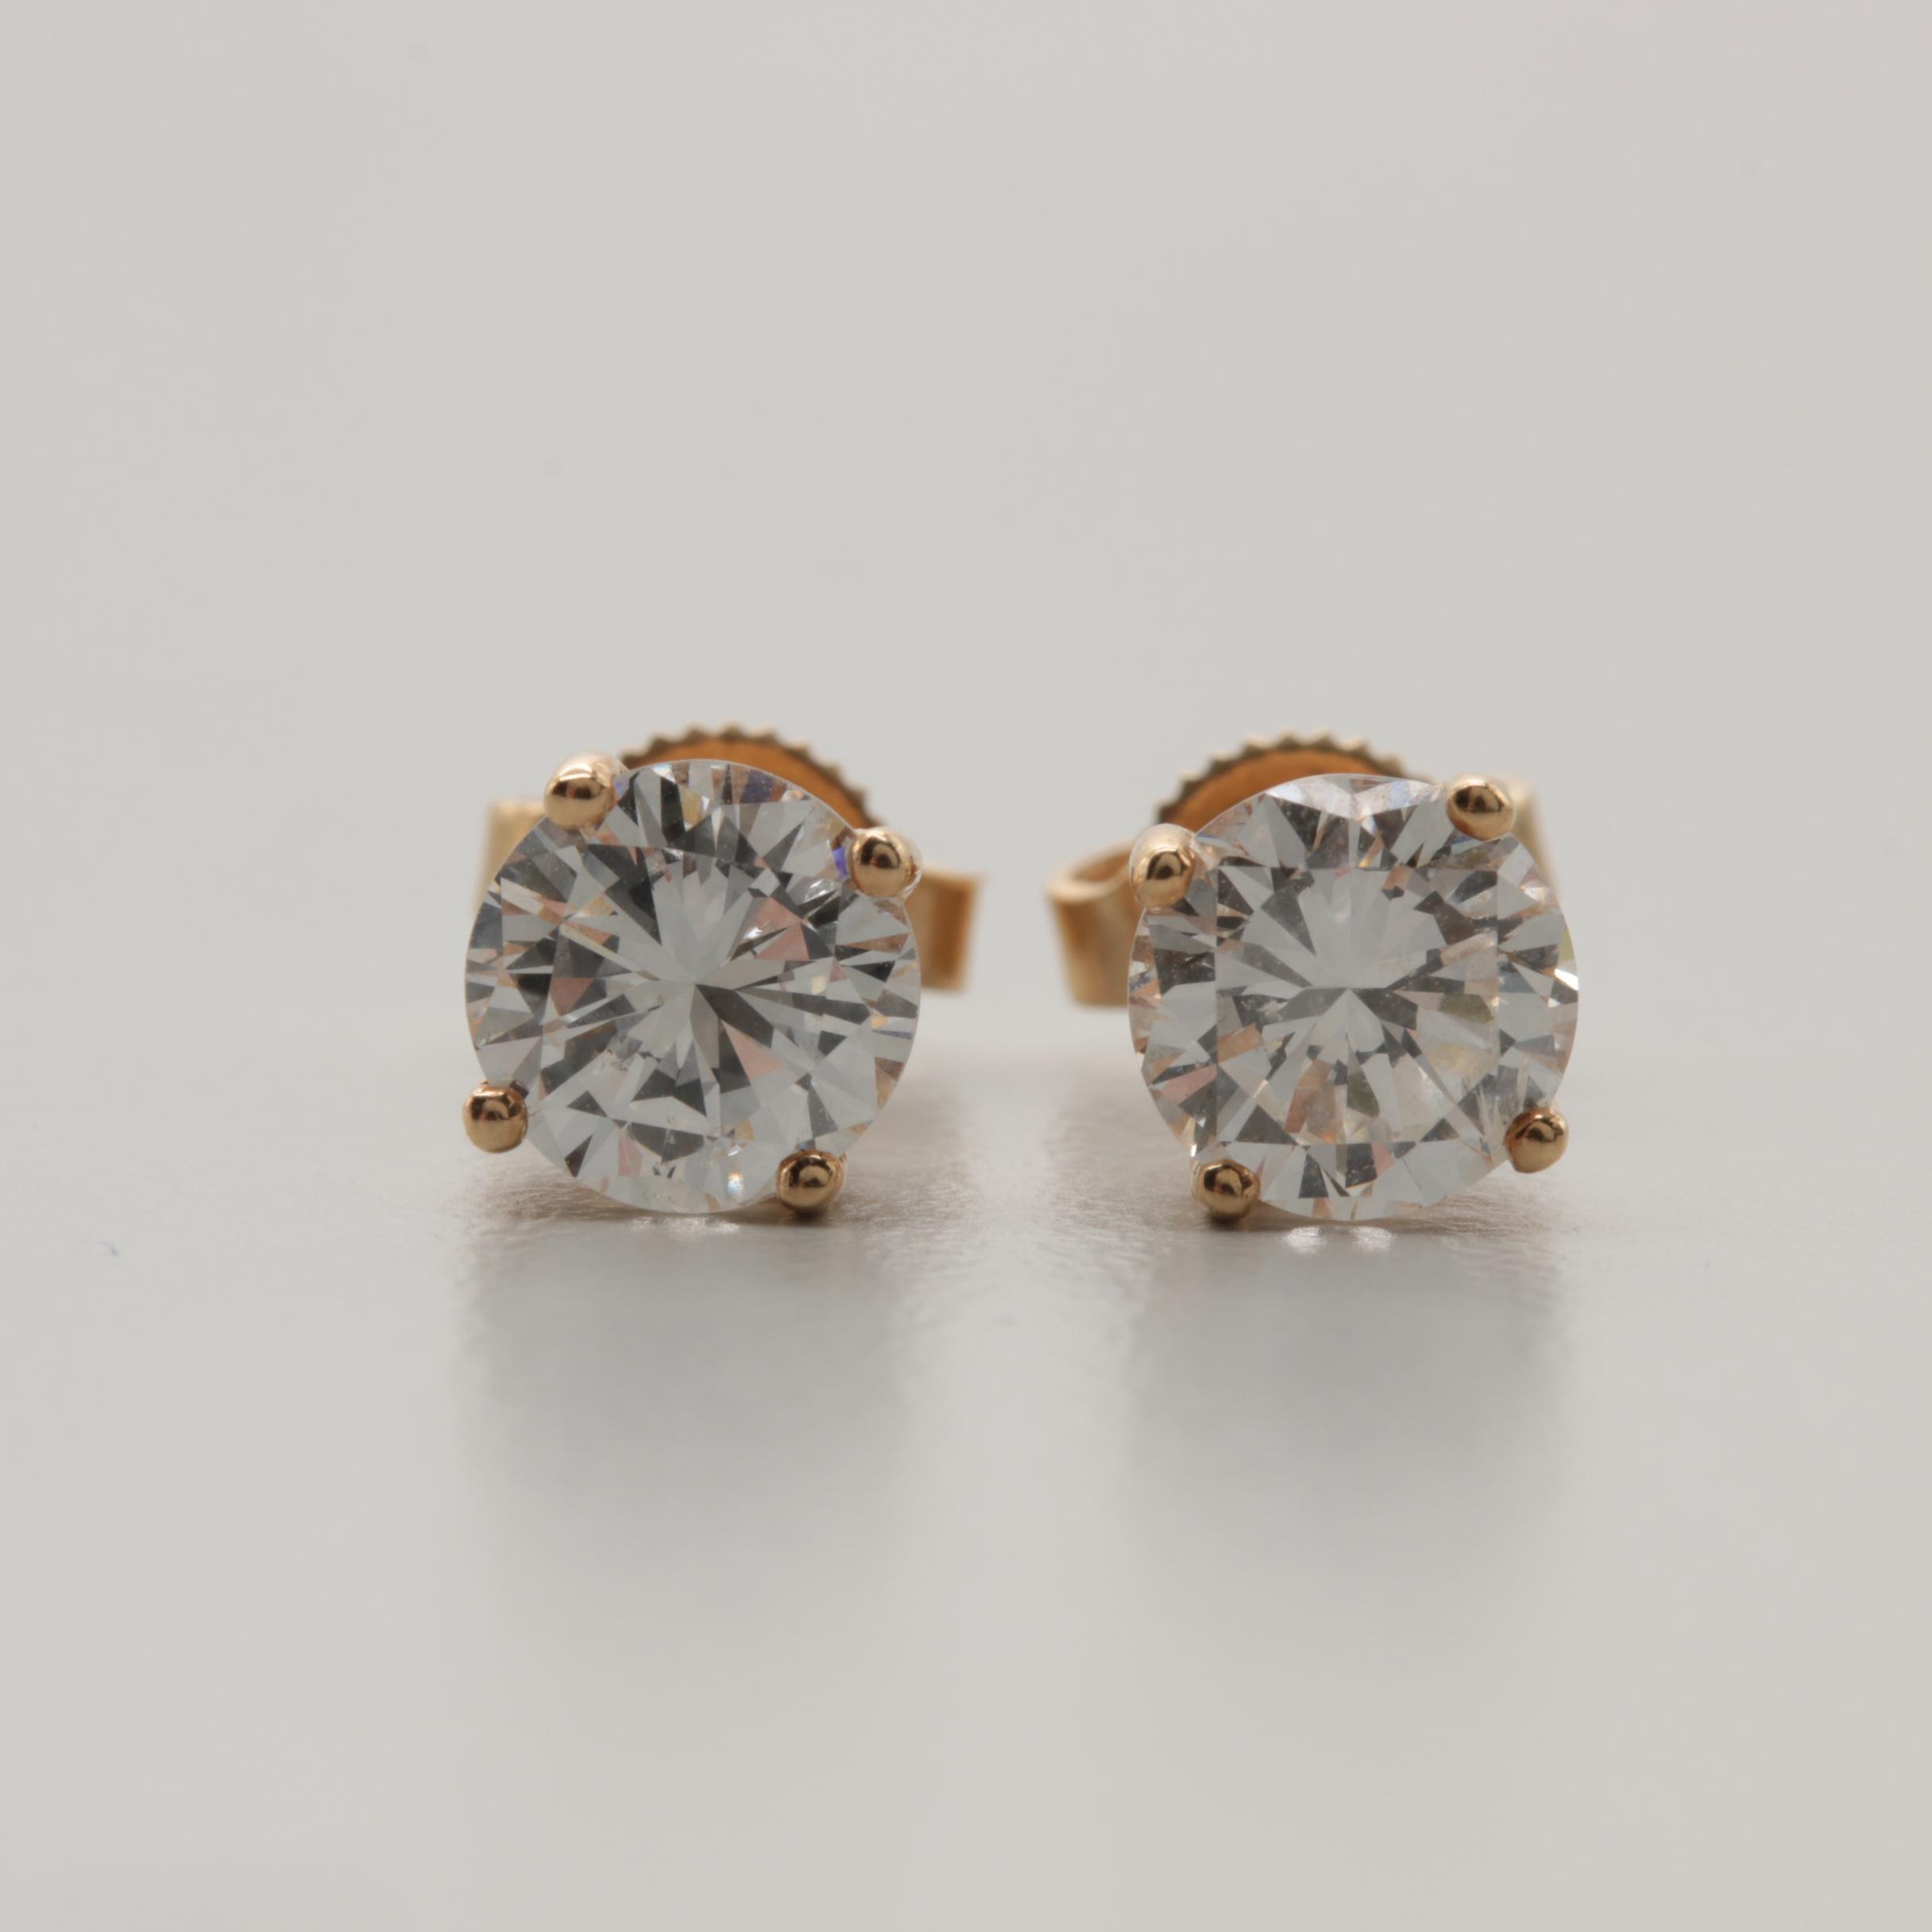 14K Yellow Gold 1.66 CTW Diamond Stud Earrings